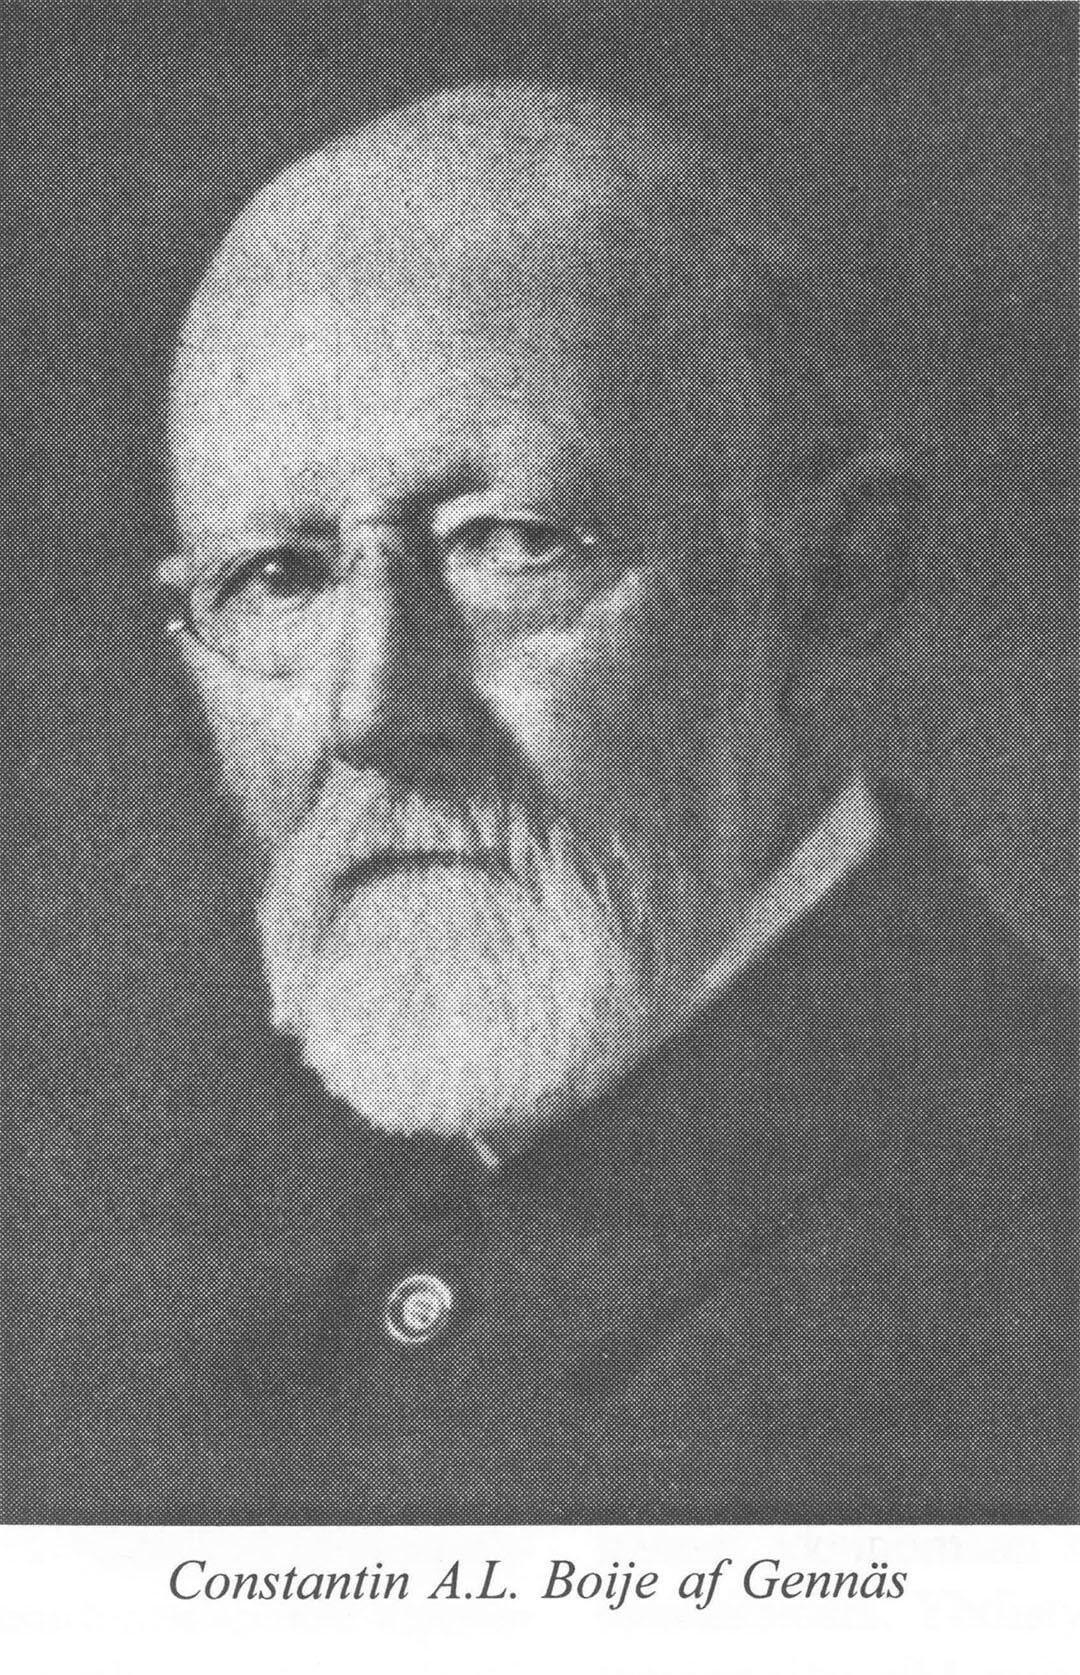 Muotokuva Constantin A.L. Boije af Gennäsistä.